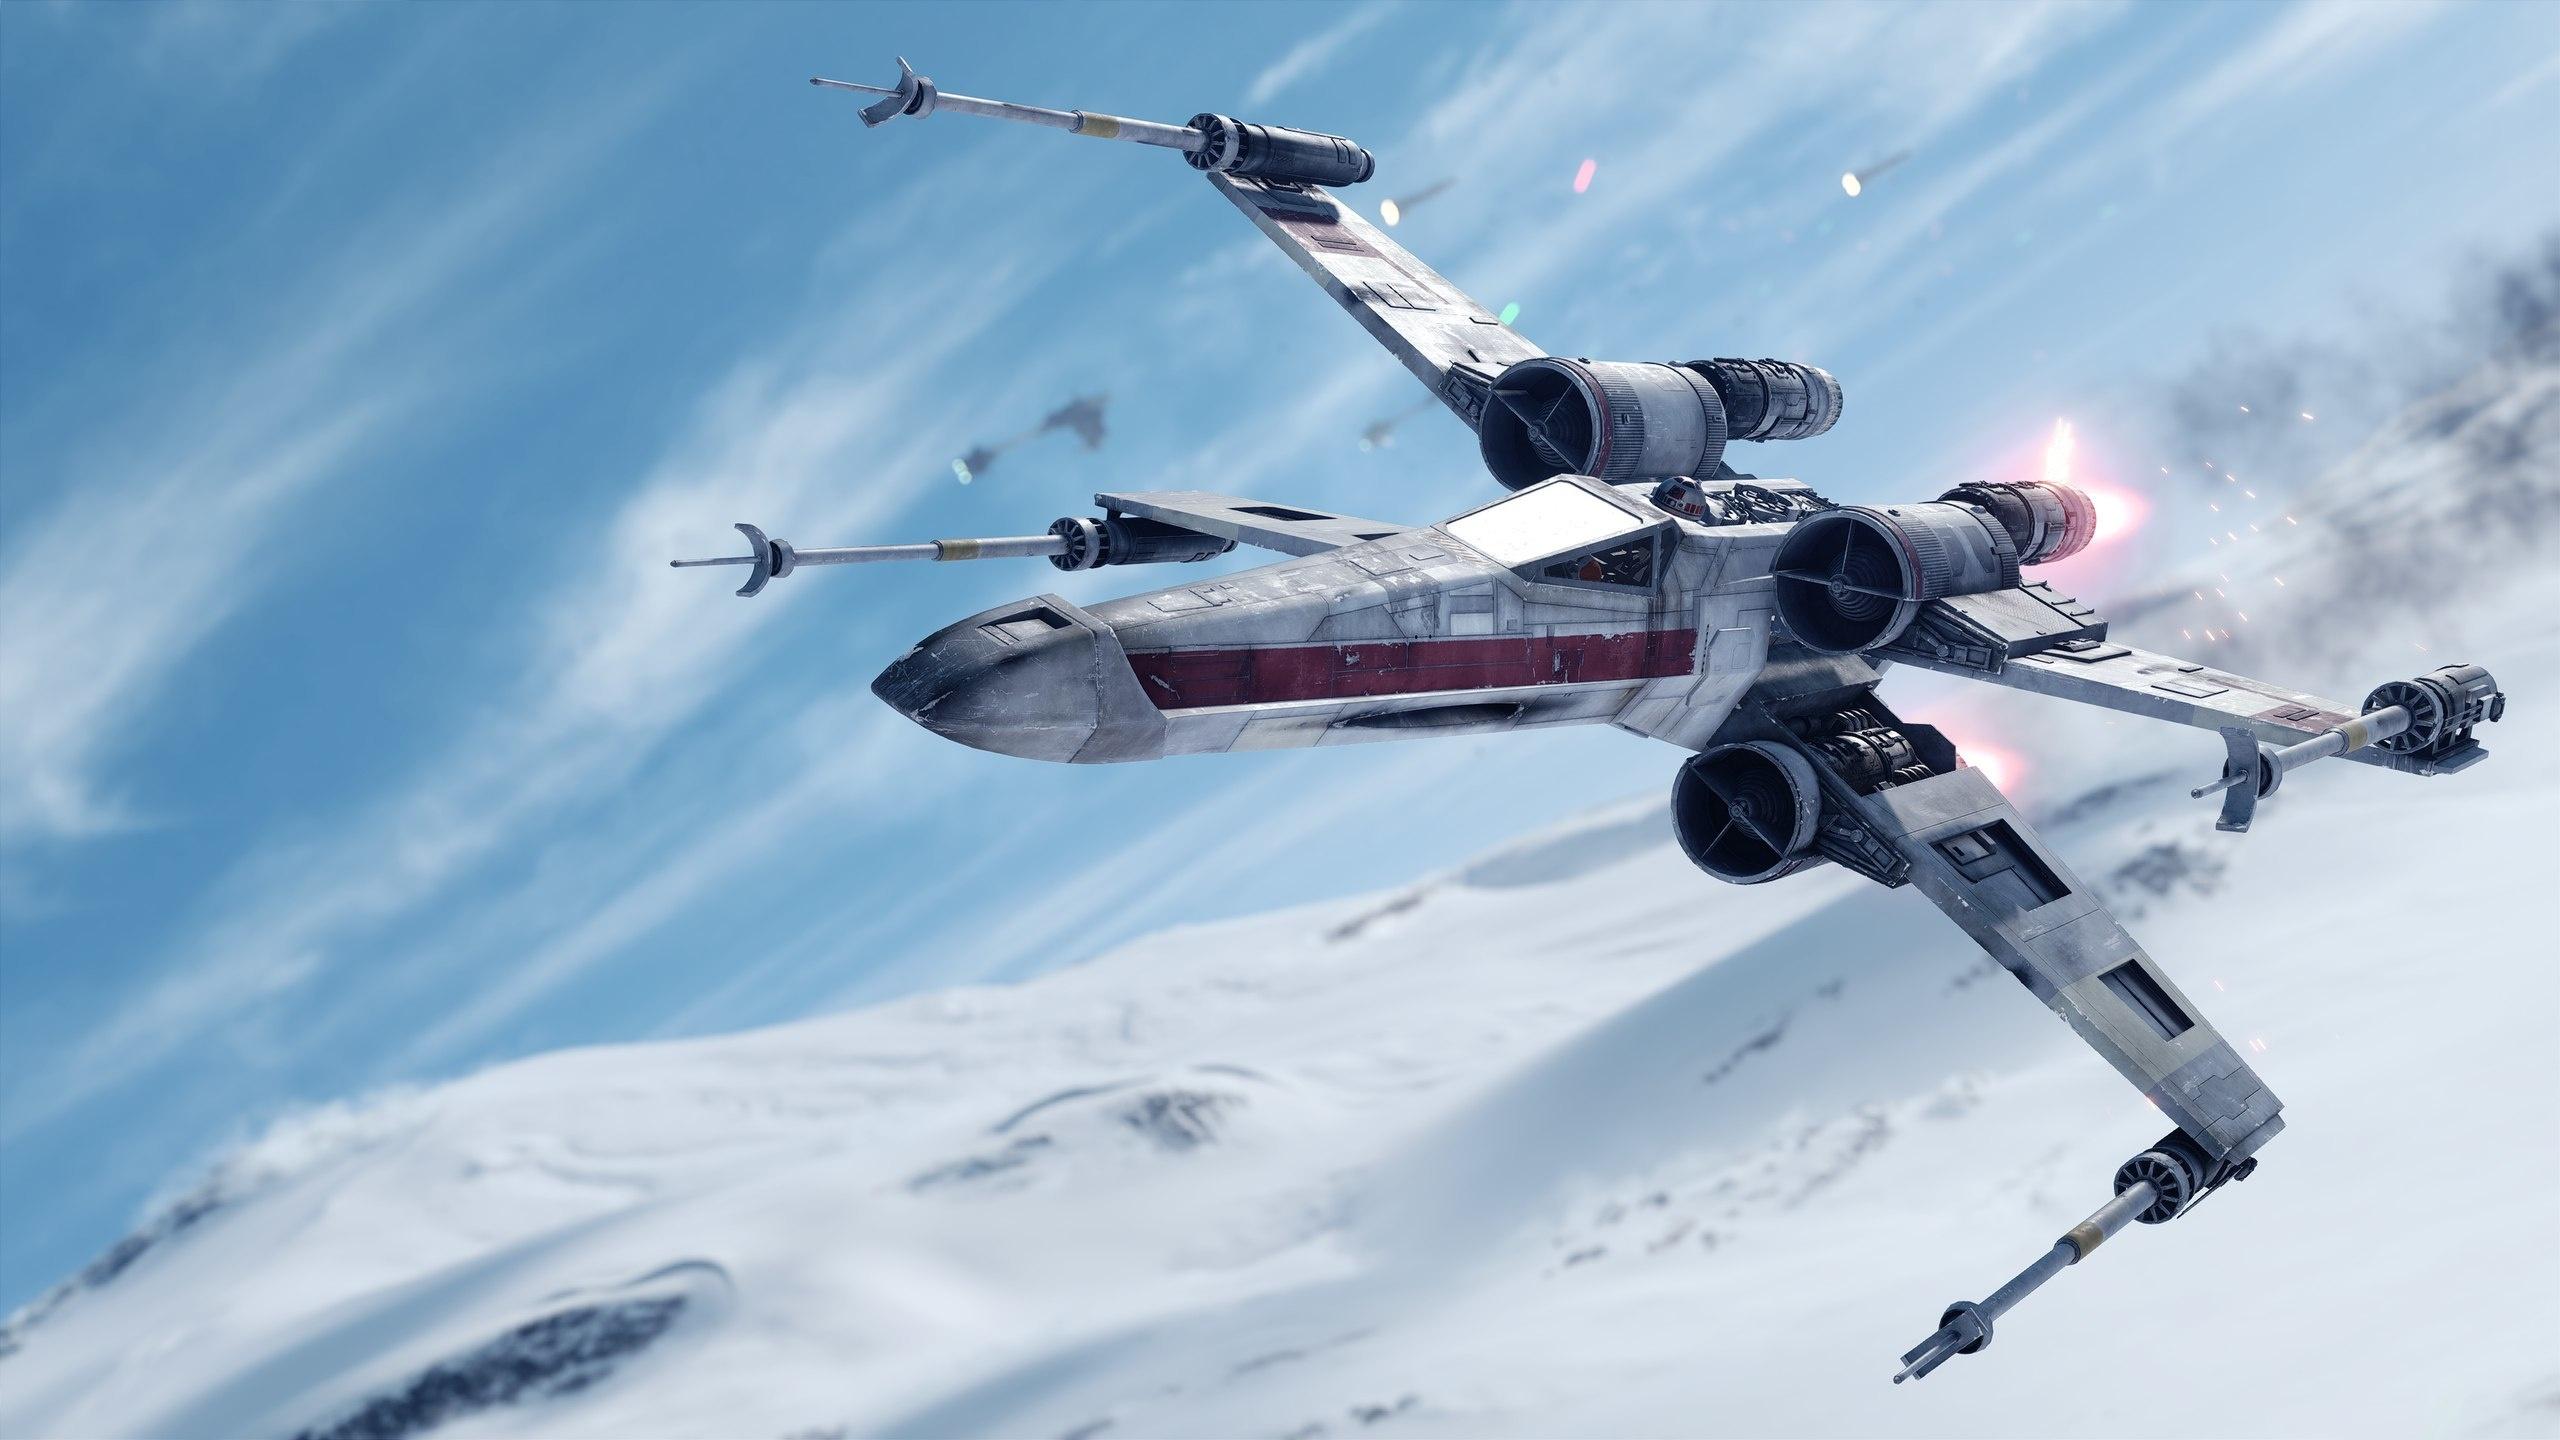 Star Wars Battlefront Fighter Jet Wallpapers In Jpg Format For Free Download